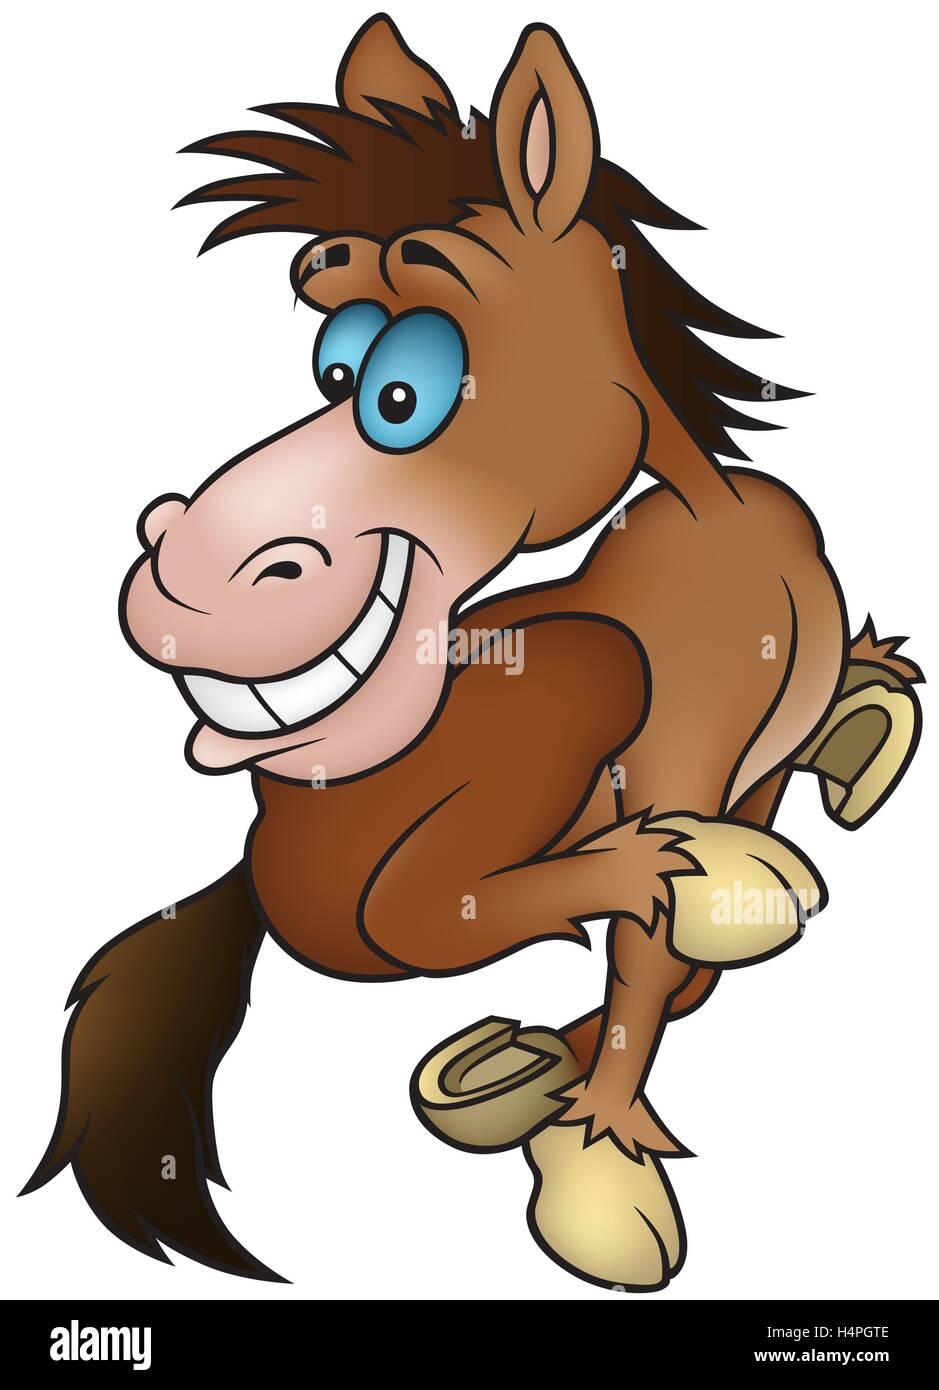 Brown Running Horse - Stock Image